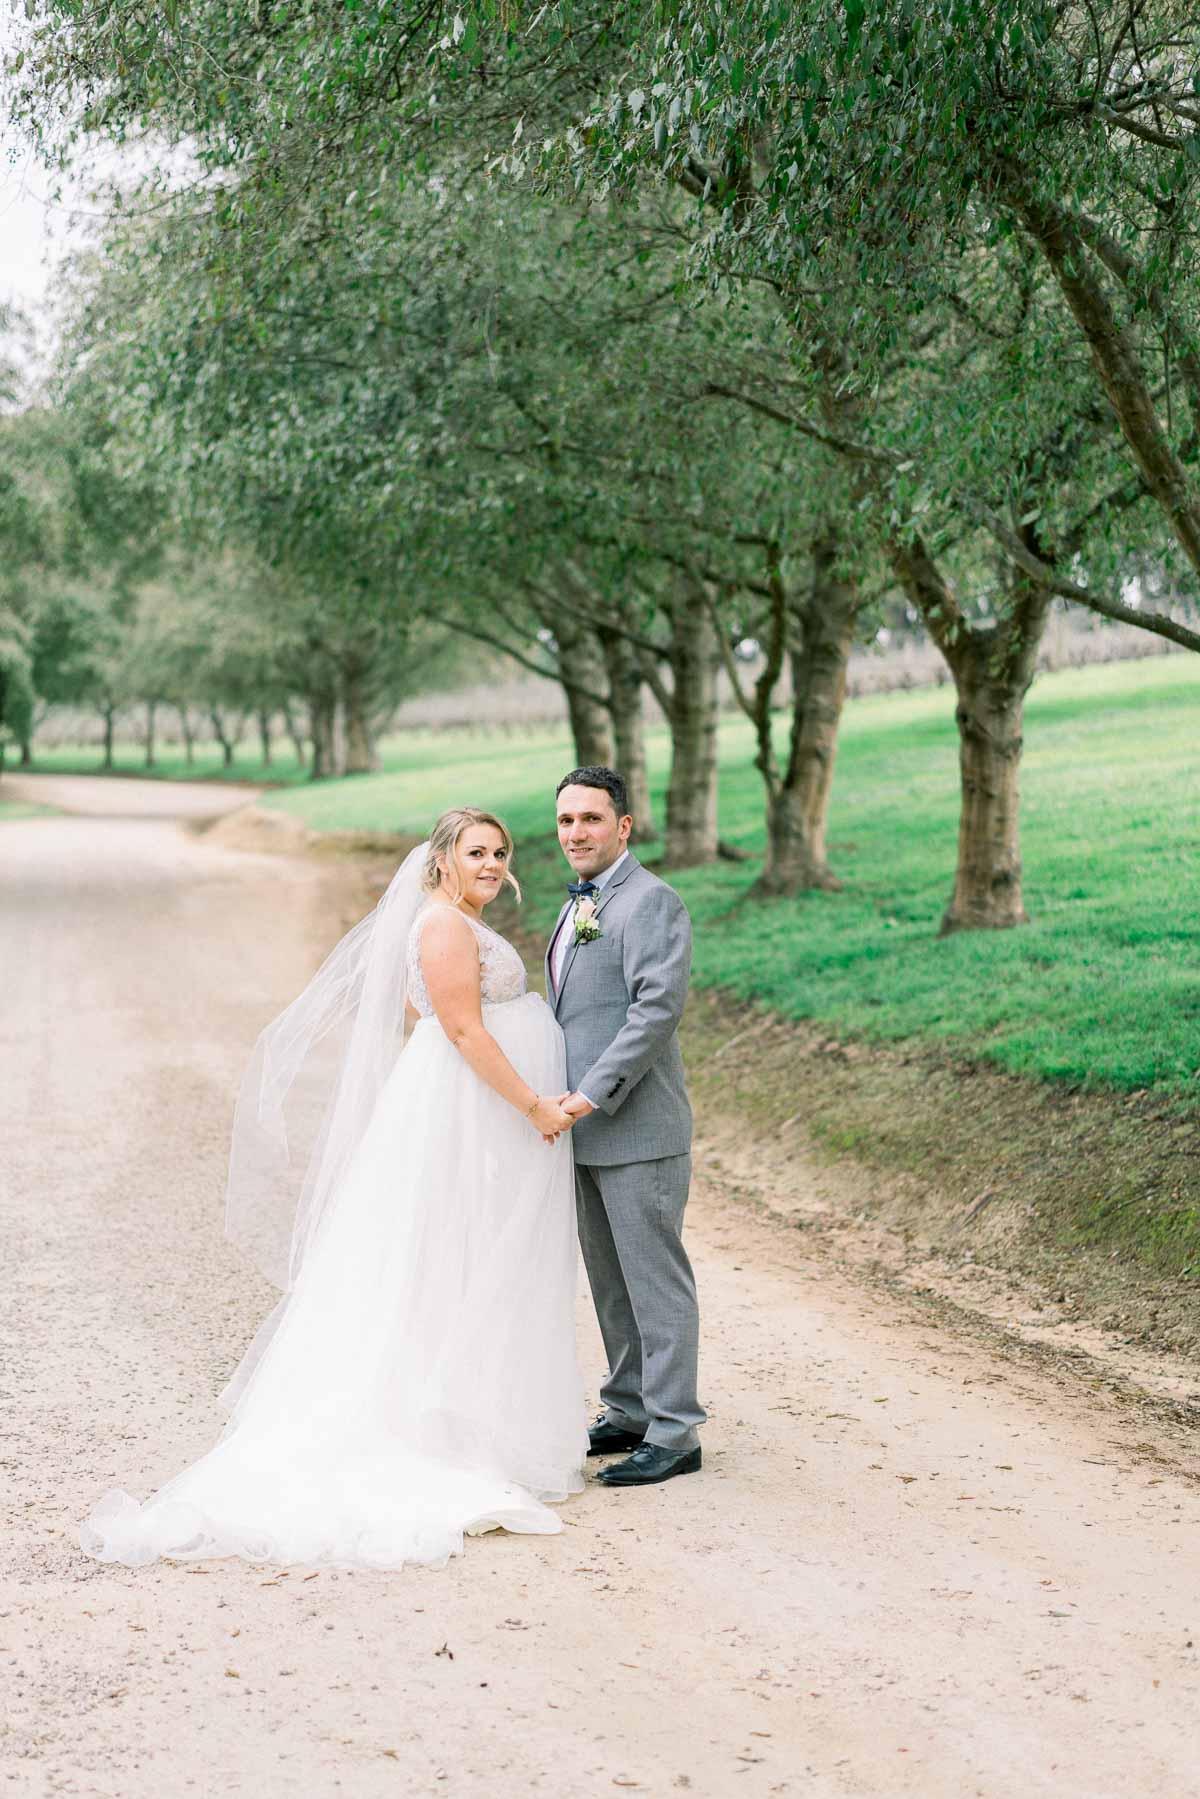 lindenderry-wedding-heart+soul-weddings-amy-alain-03697.jpg